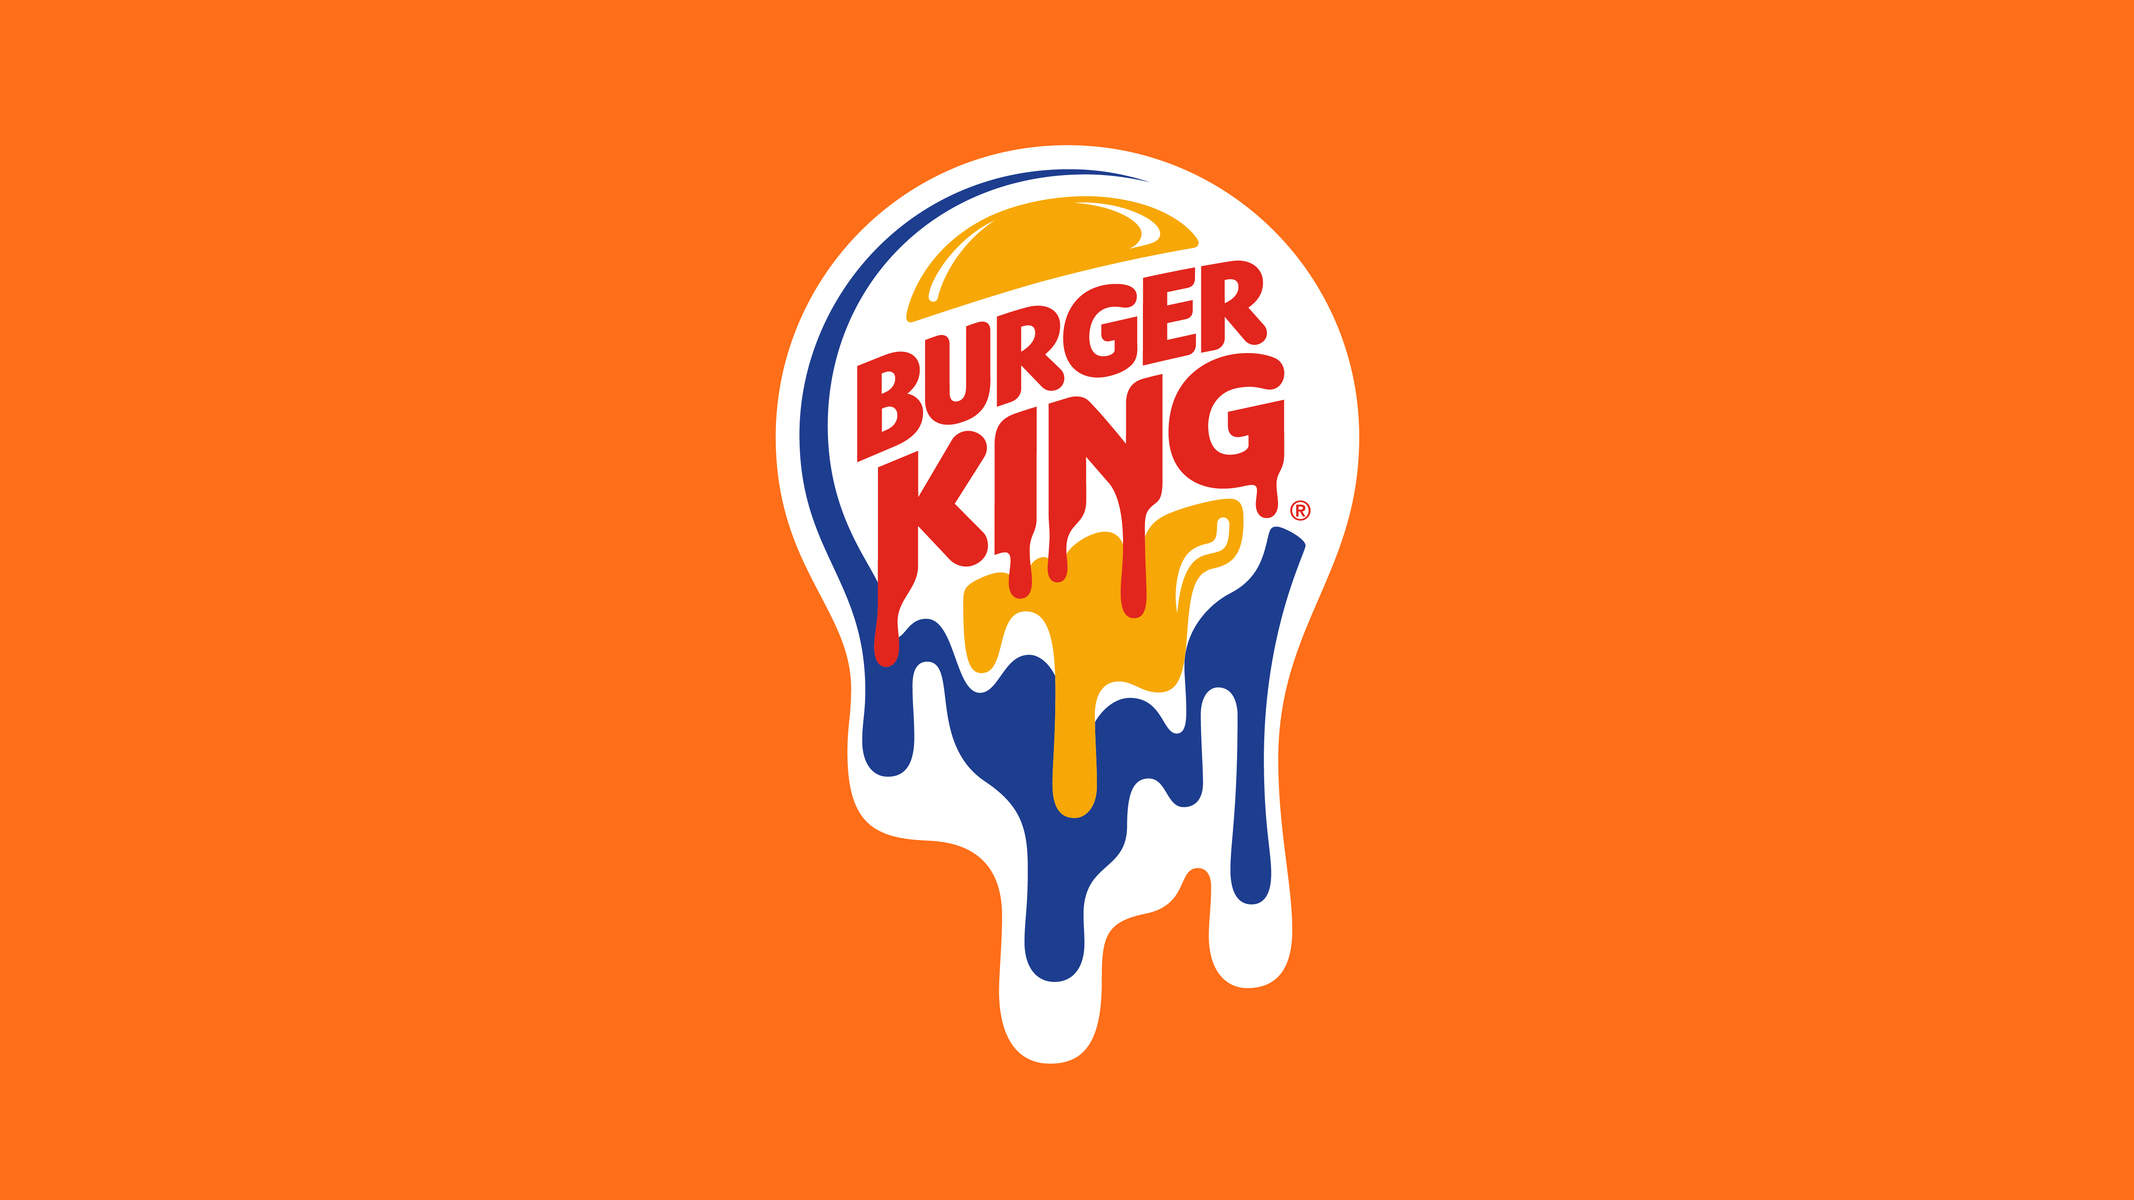 News: Burger King® UK is Melting Down Plastic Toys for Good